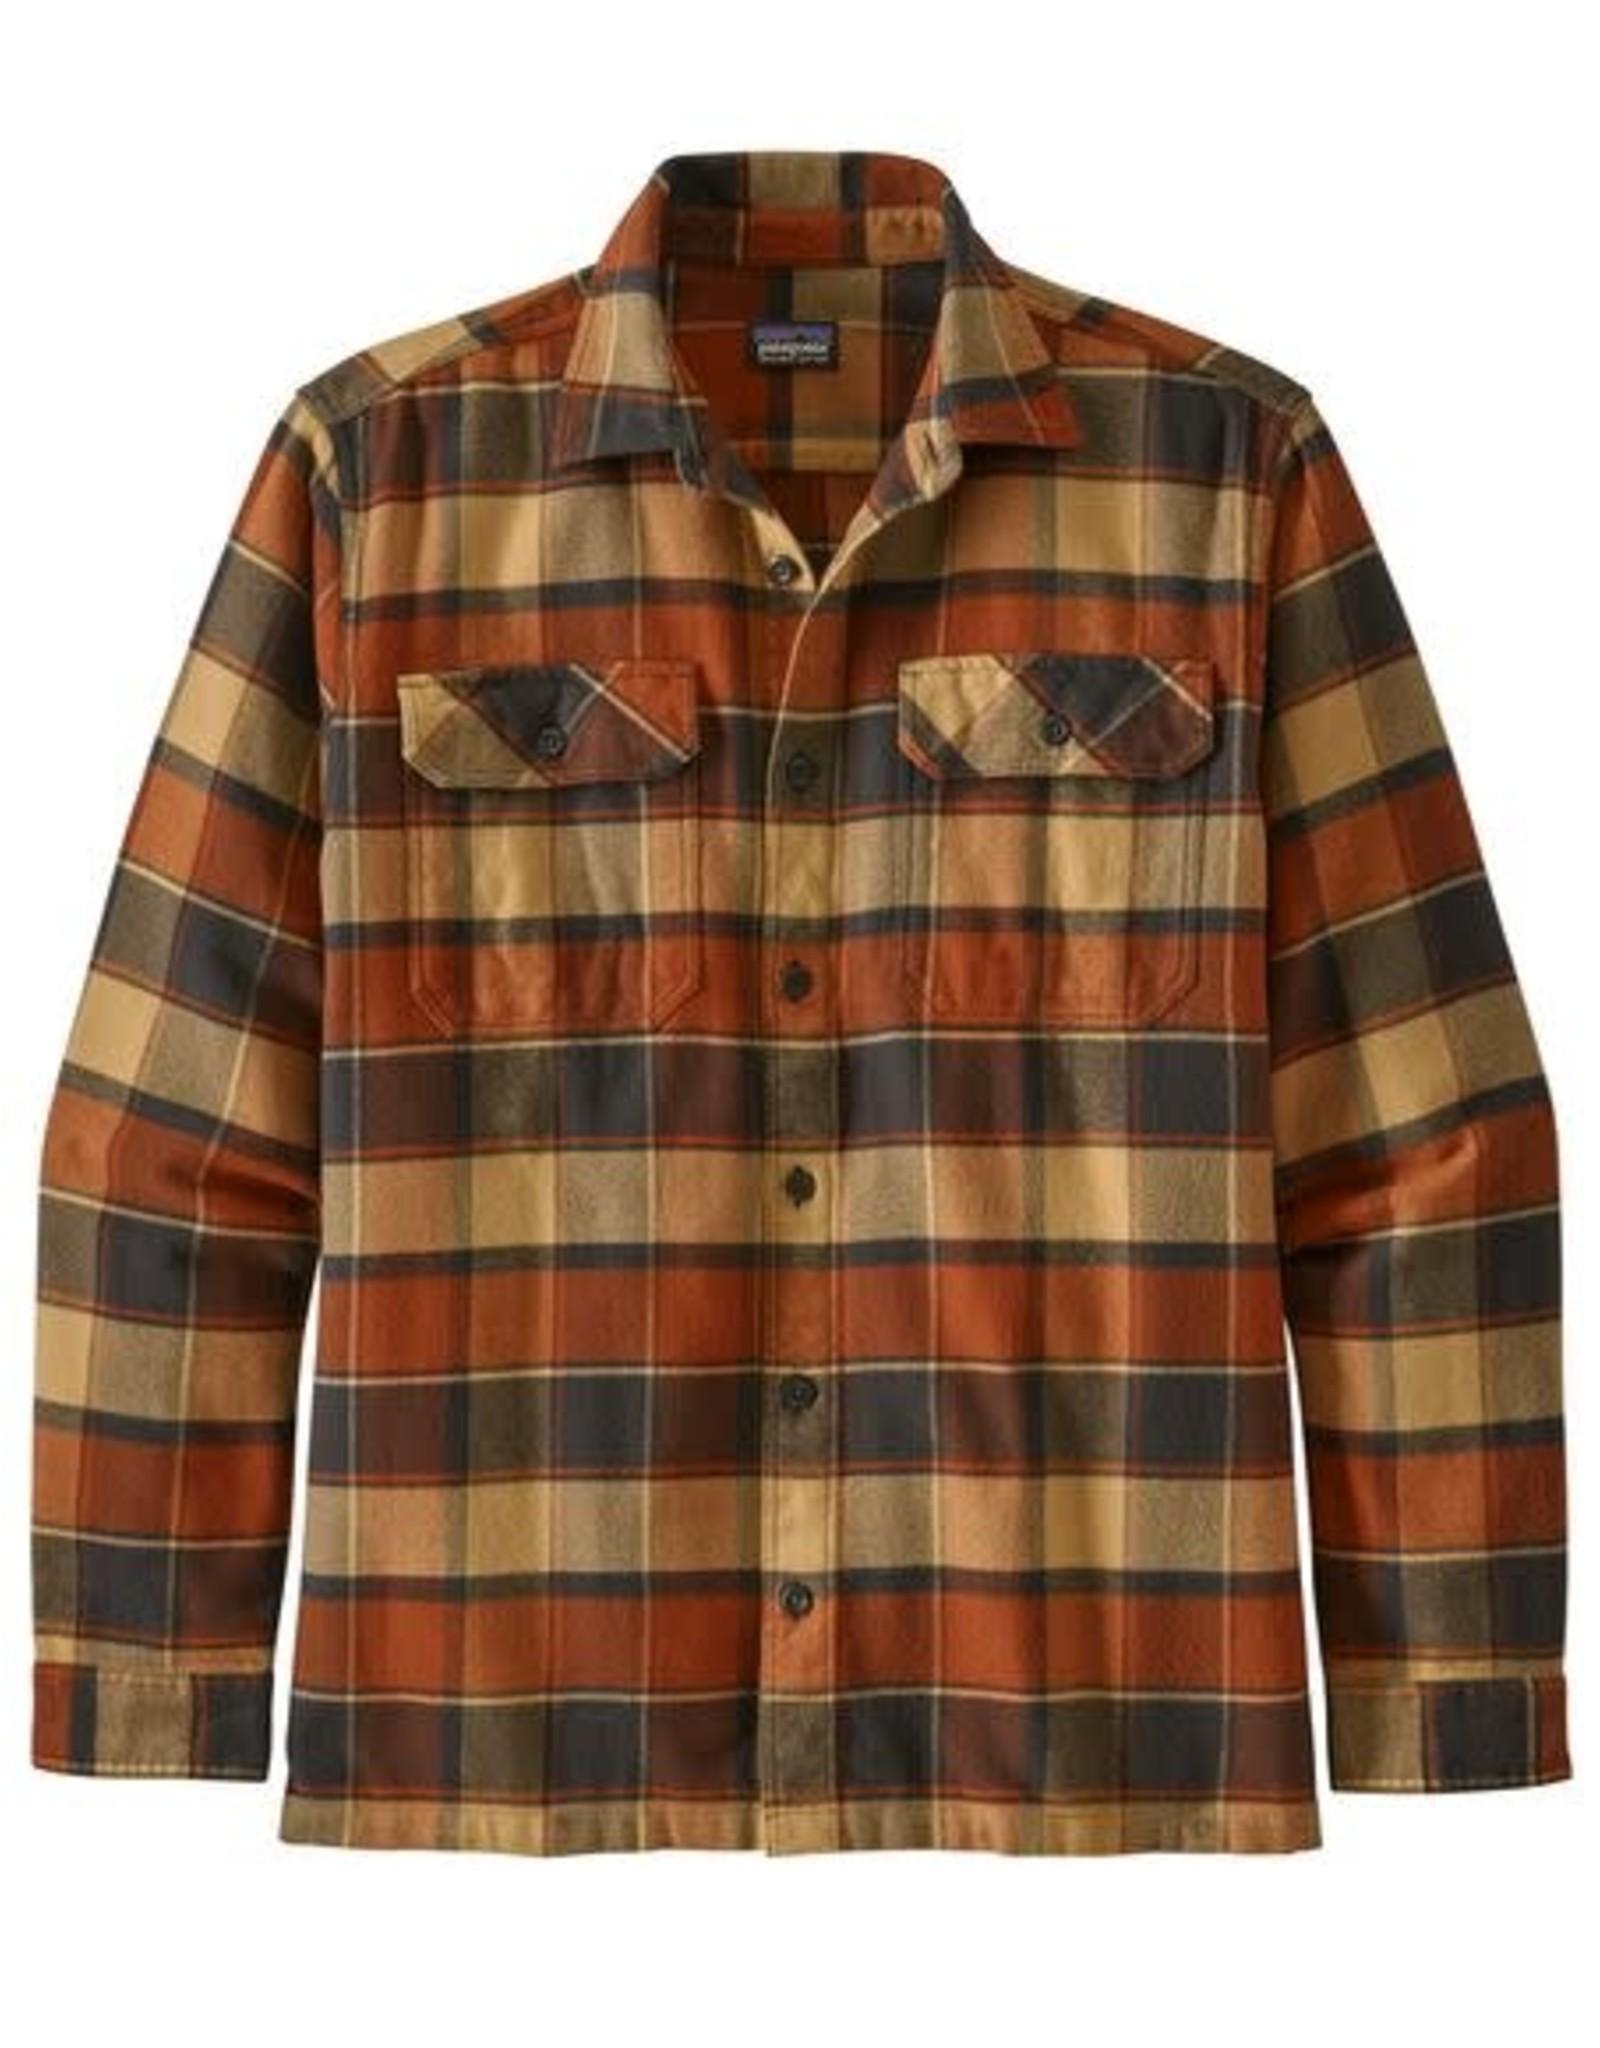 Patagonia Patagonia M's L/S Fjord Flannel Shirt